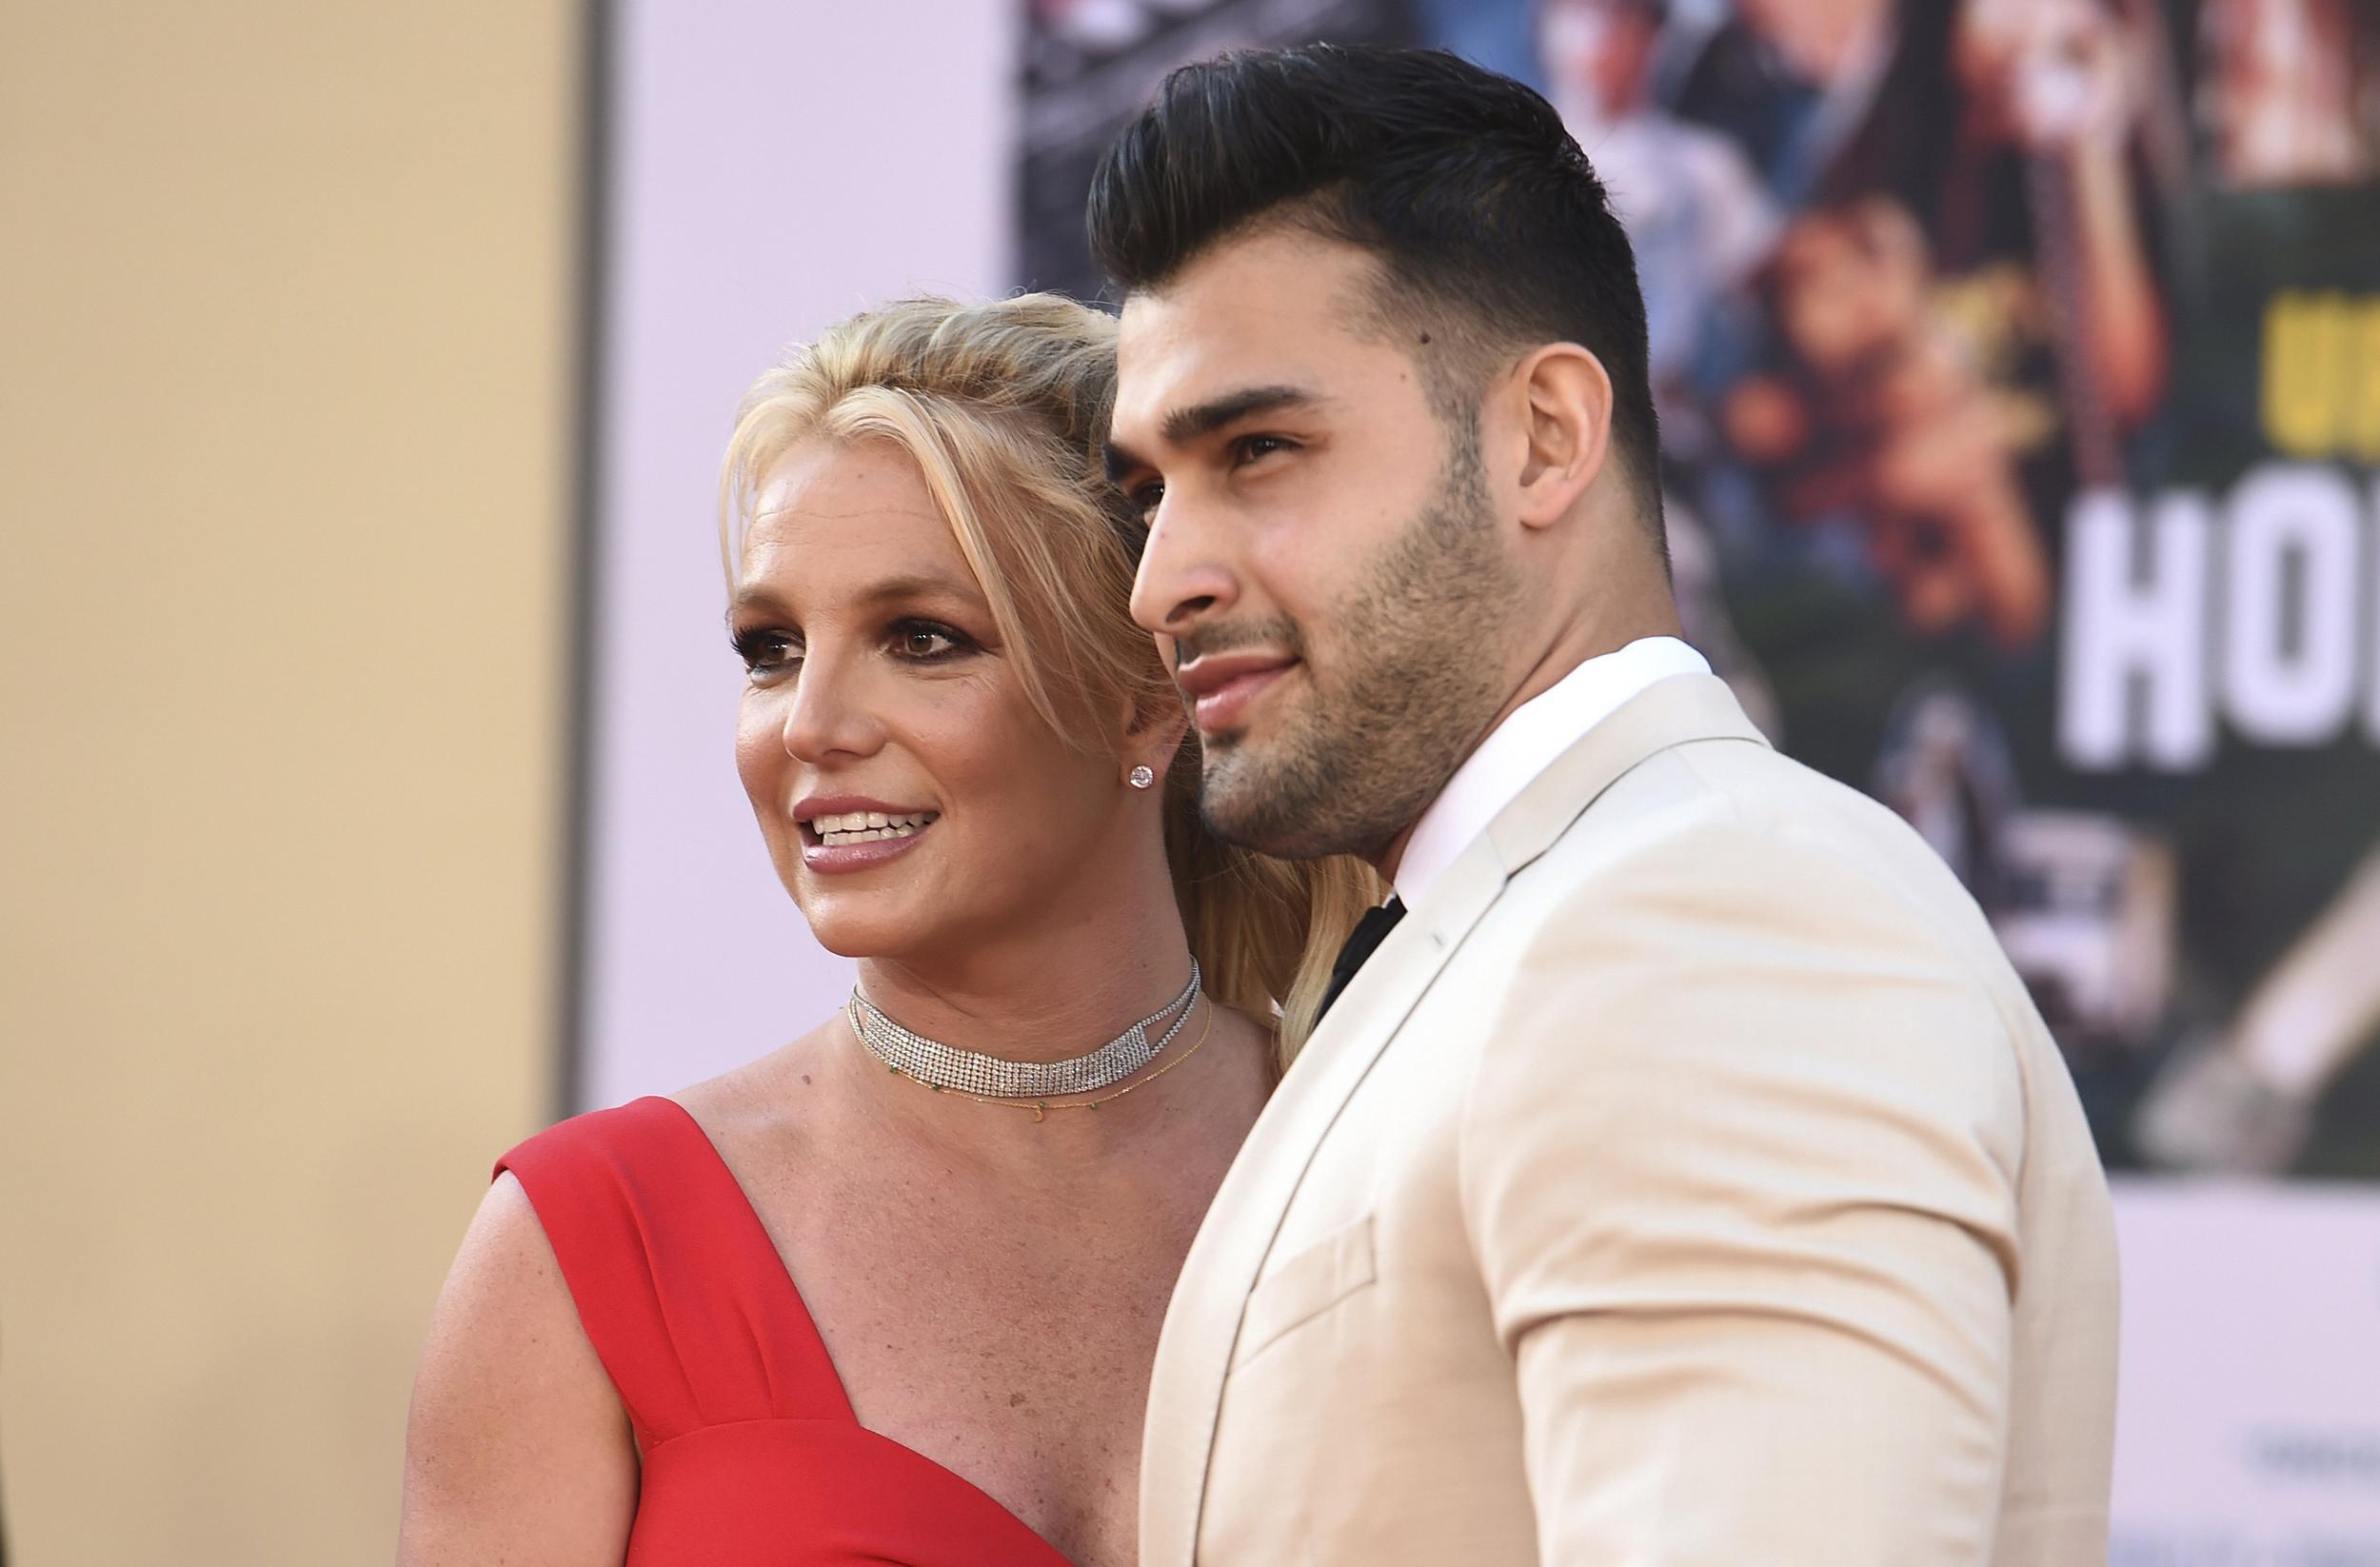 Britney Spears' fiancé responds to Octavia Spencer's comment that singer should get a prenup